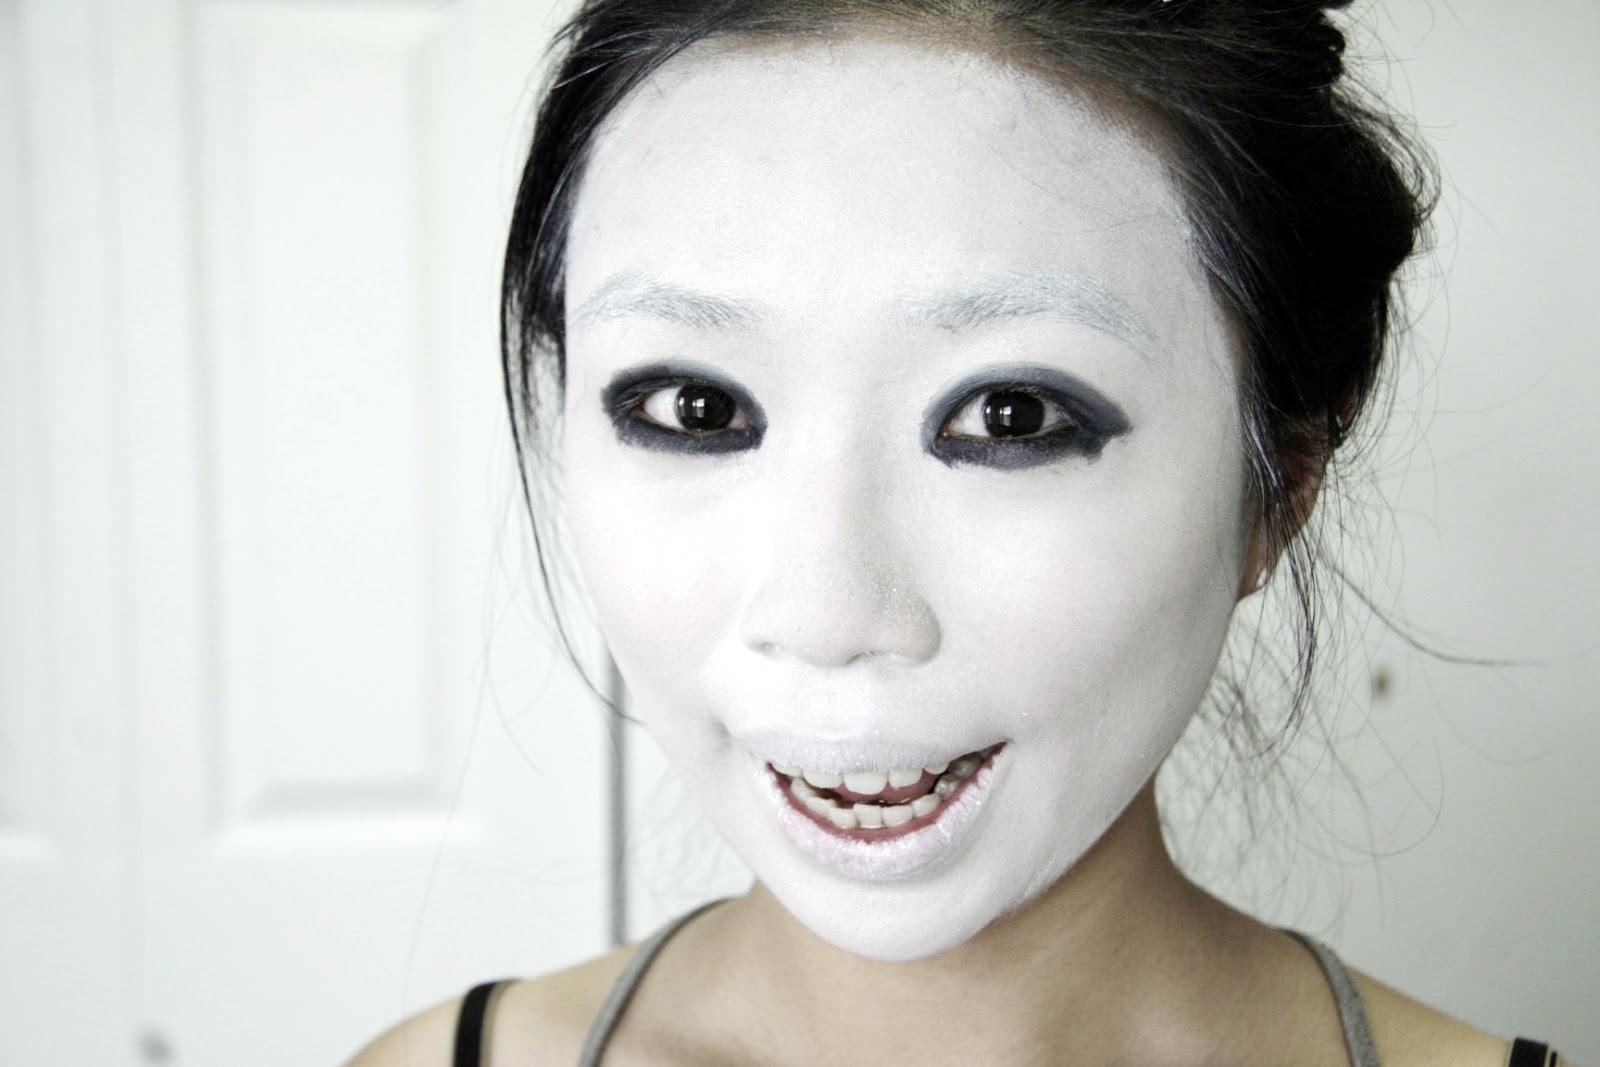 fun size beauty: #HALLOWEEN  American Horror Story Asylum - White And Black Halloween Makeup